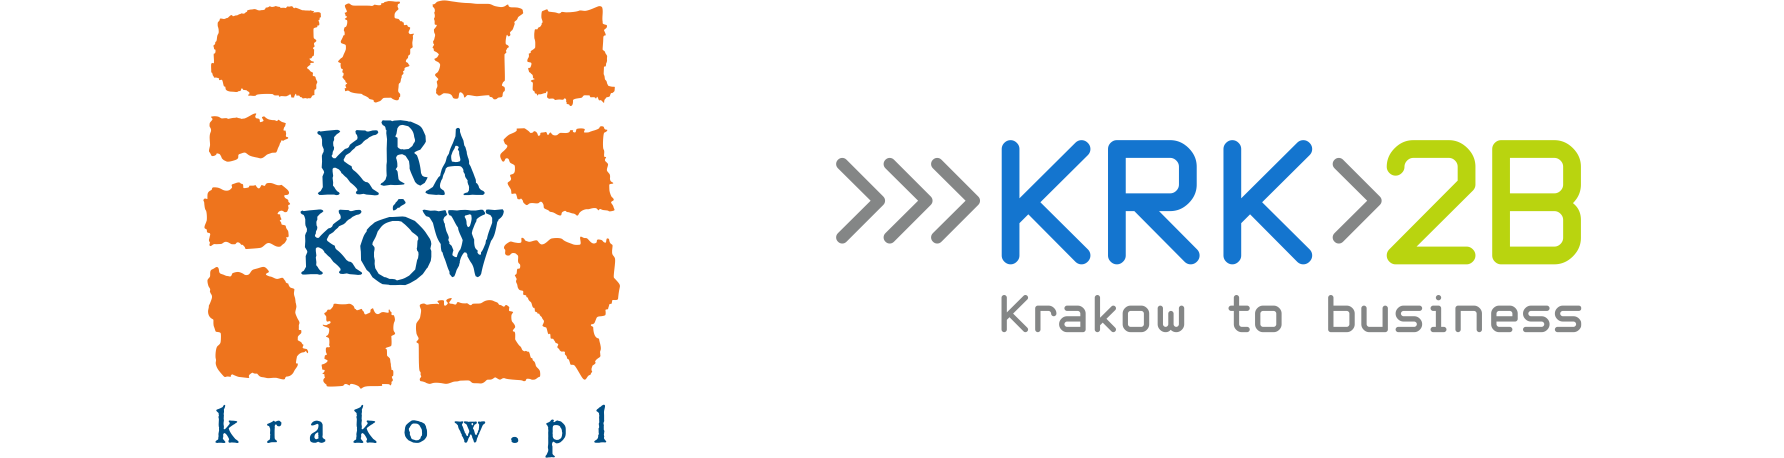 www.krakow.pl/biznes